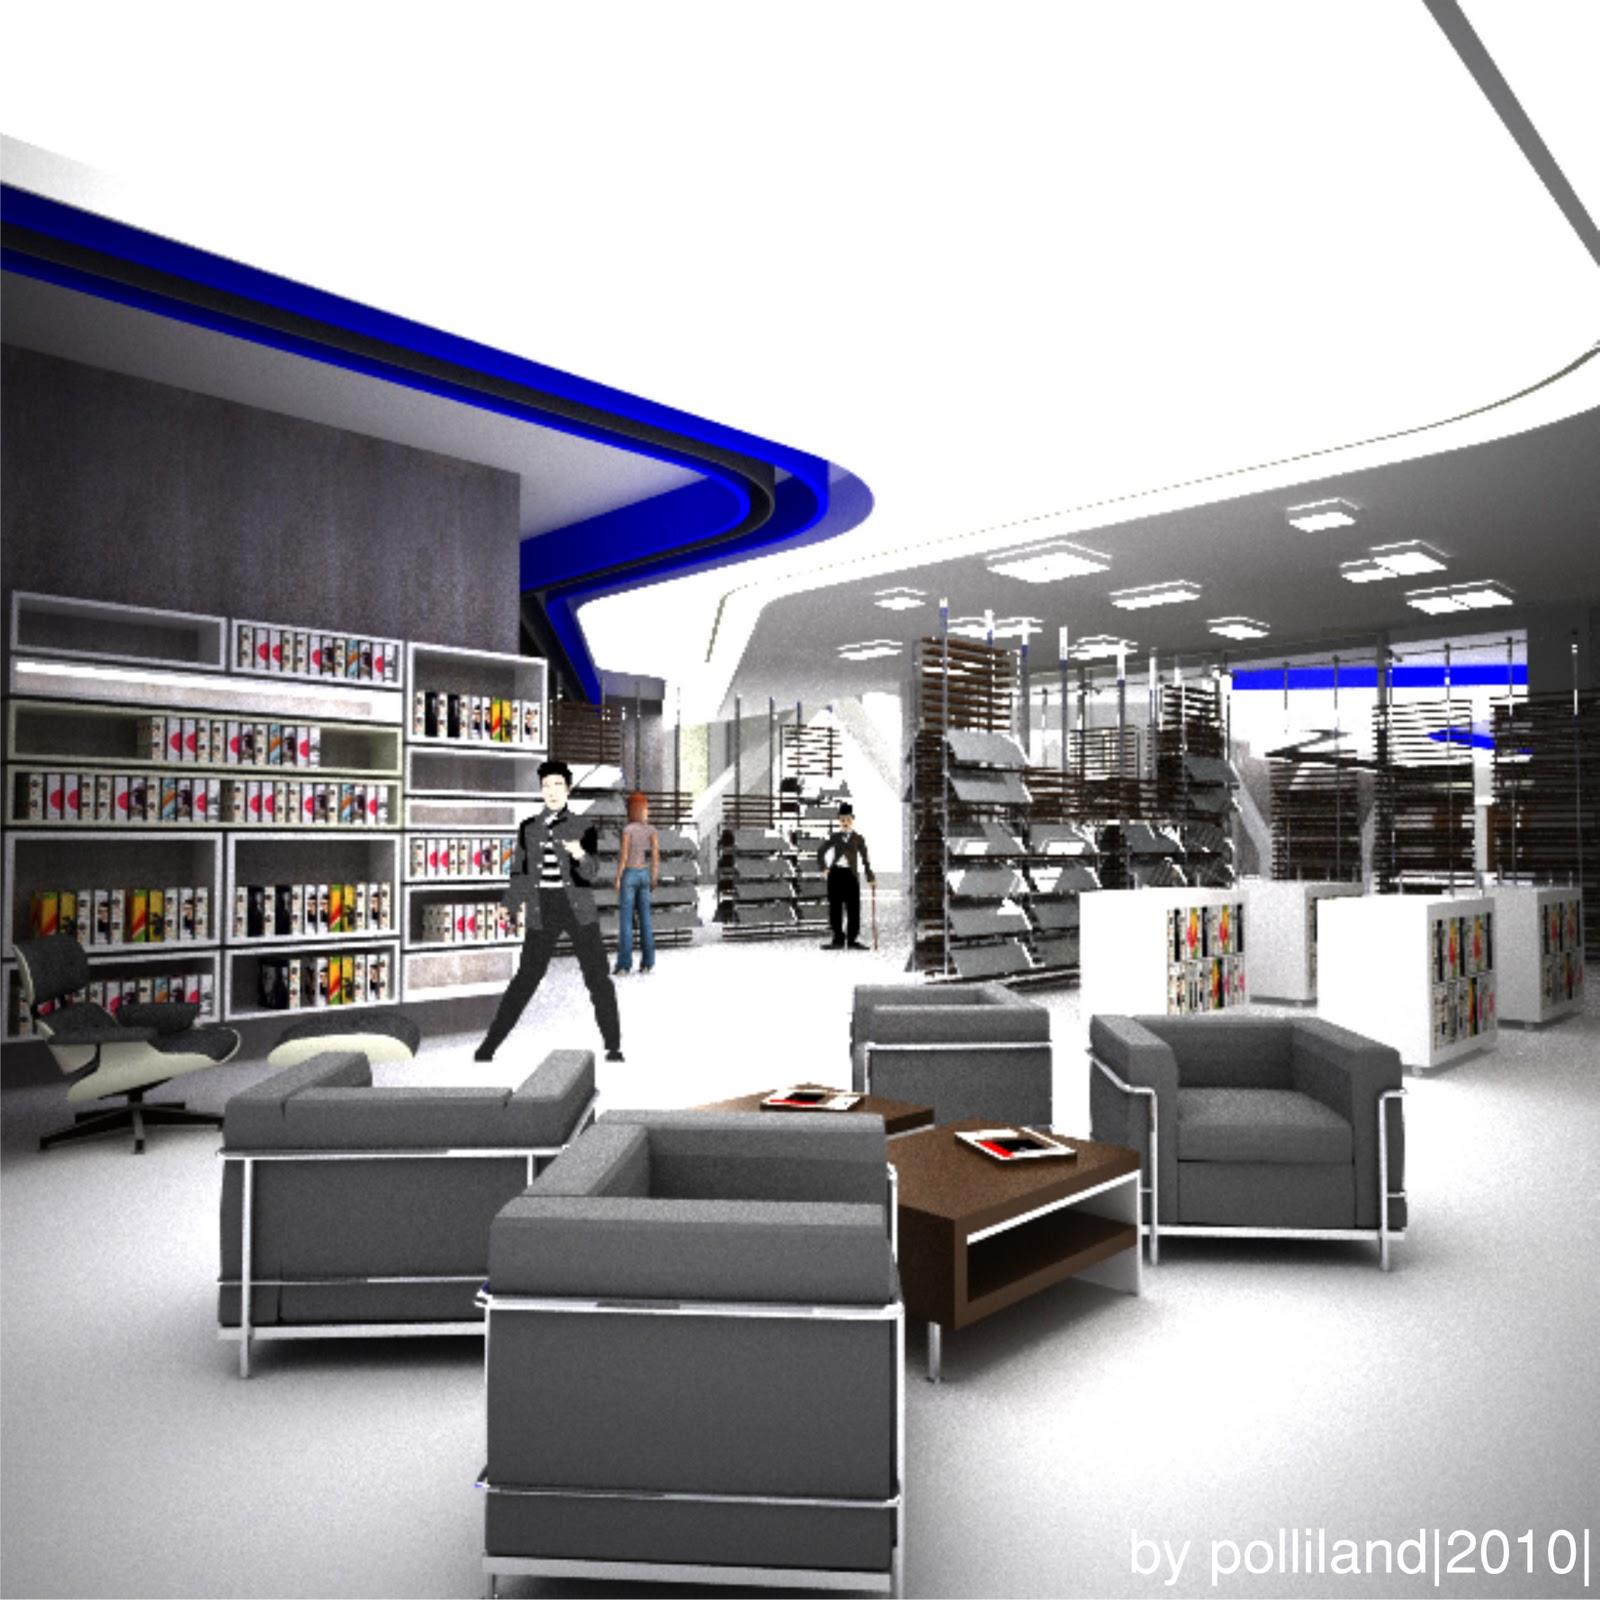 Polliland espacio interior biblioteca 2010 - Bauhaus iluminacion interior ...